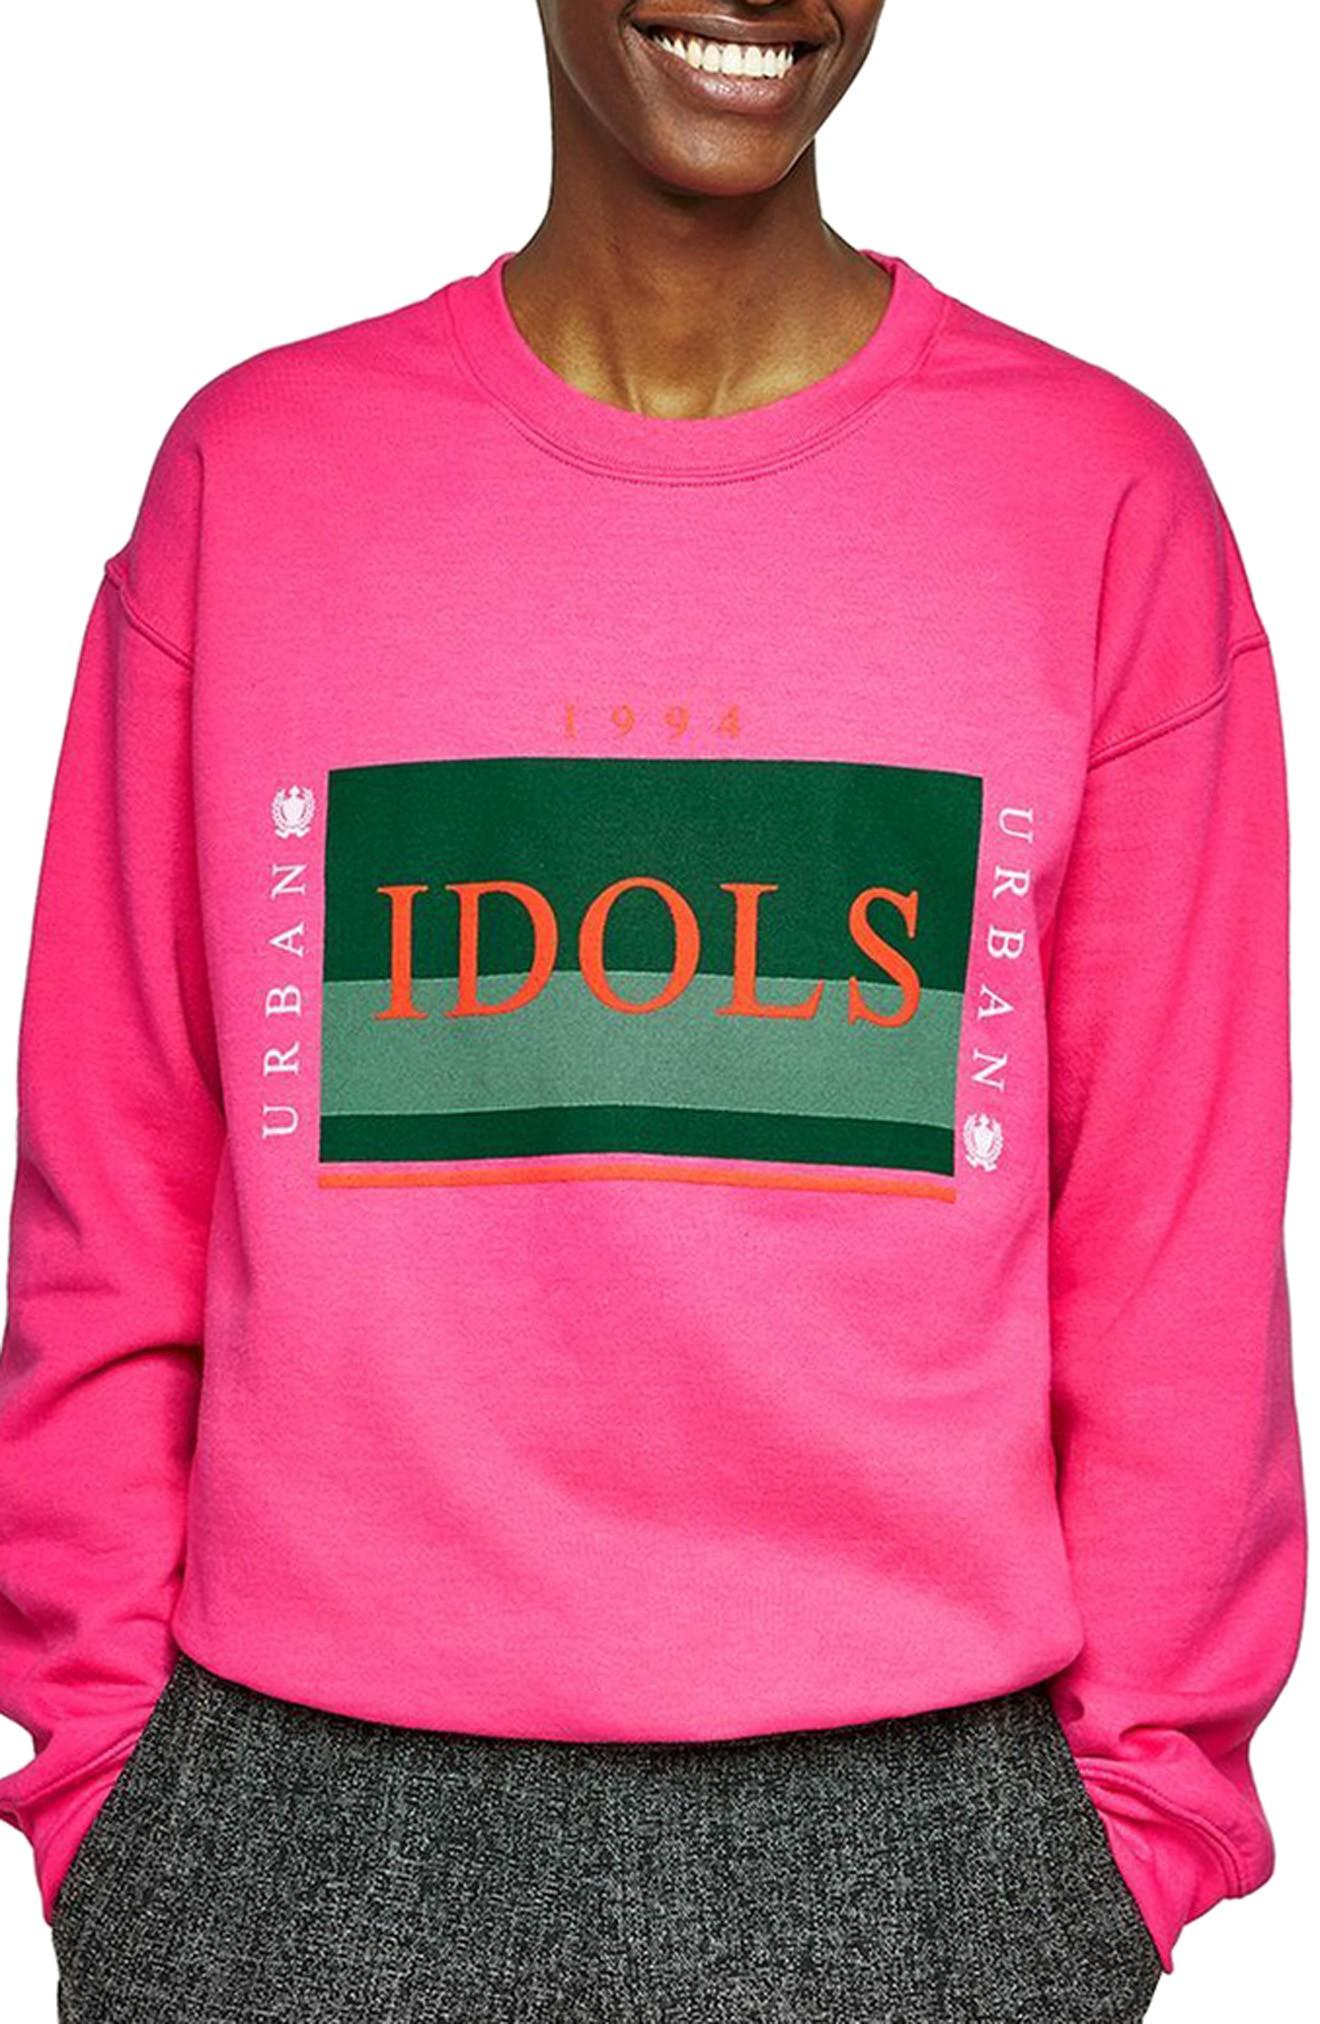 Topman Urban Idols Graphic Sweatshirt In Pink Multi